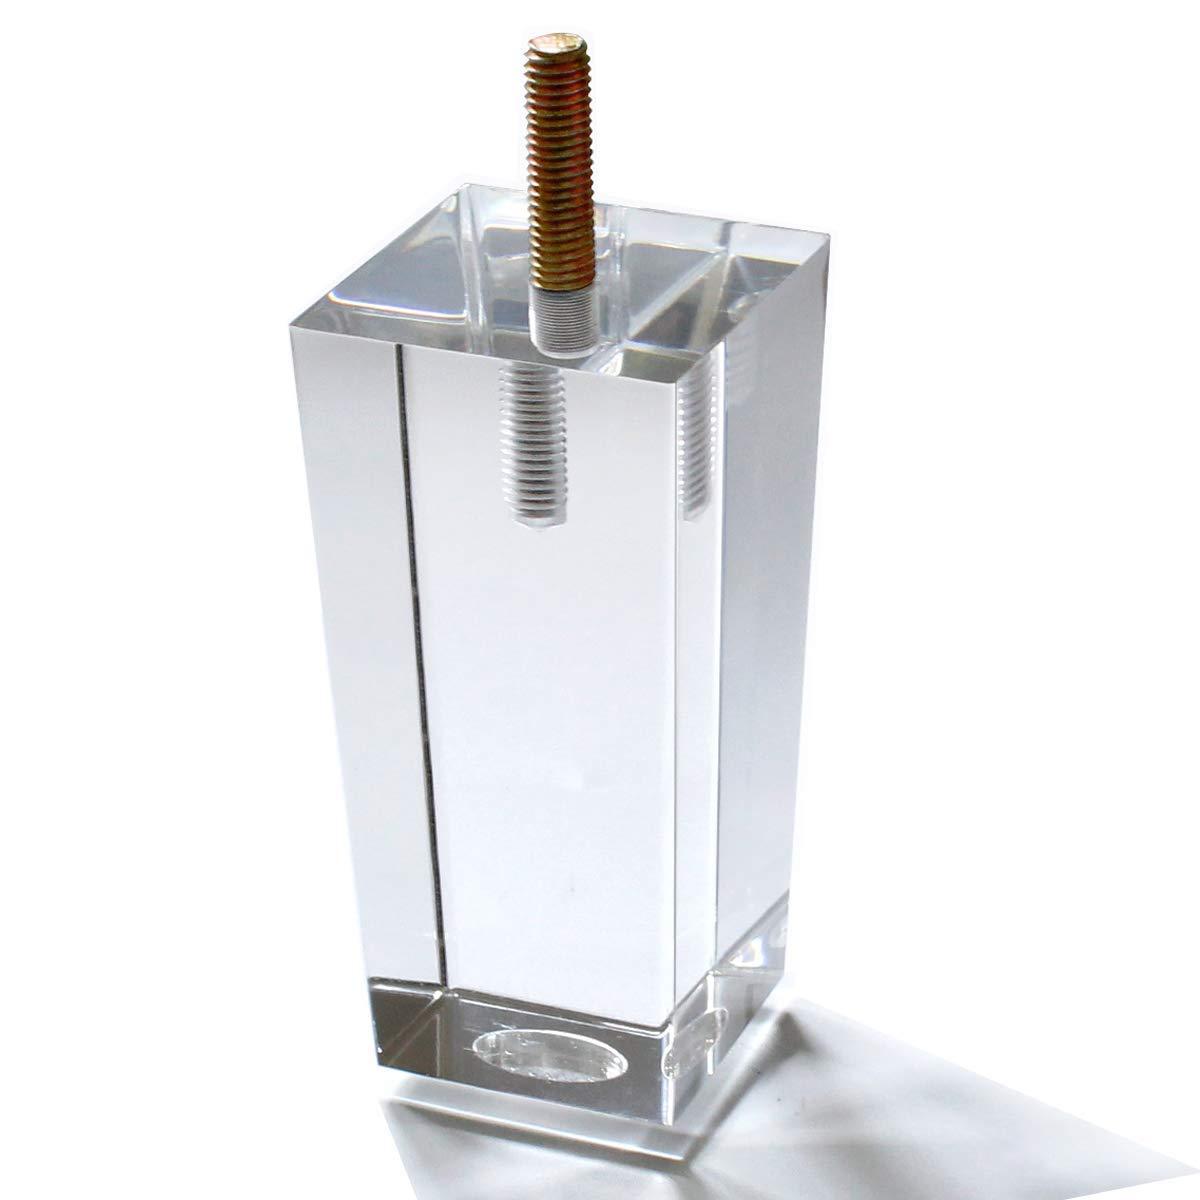 Aoryvic 4 Inch Pyramid Acrylic Furniture Diy Legs Clear Glass